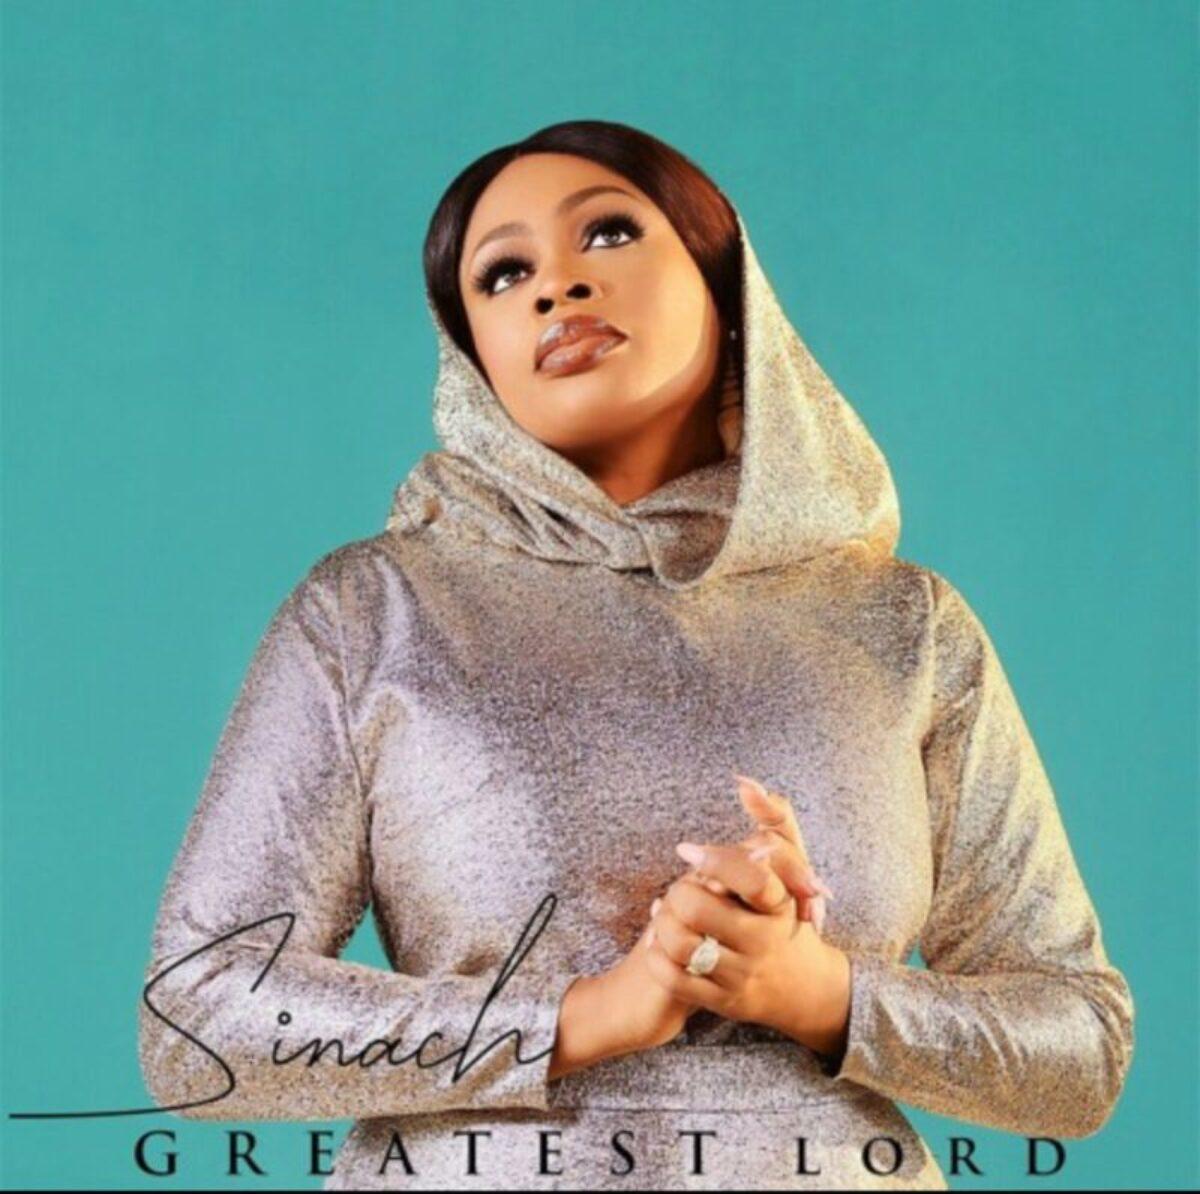 Sinach-Greatest-Lord-Album-Mp3